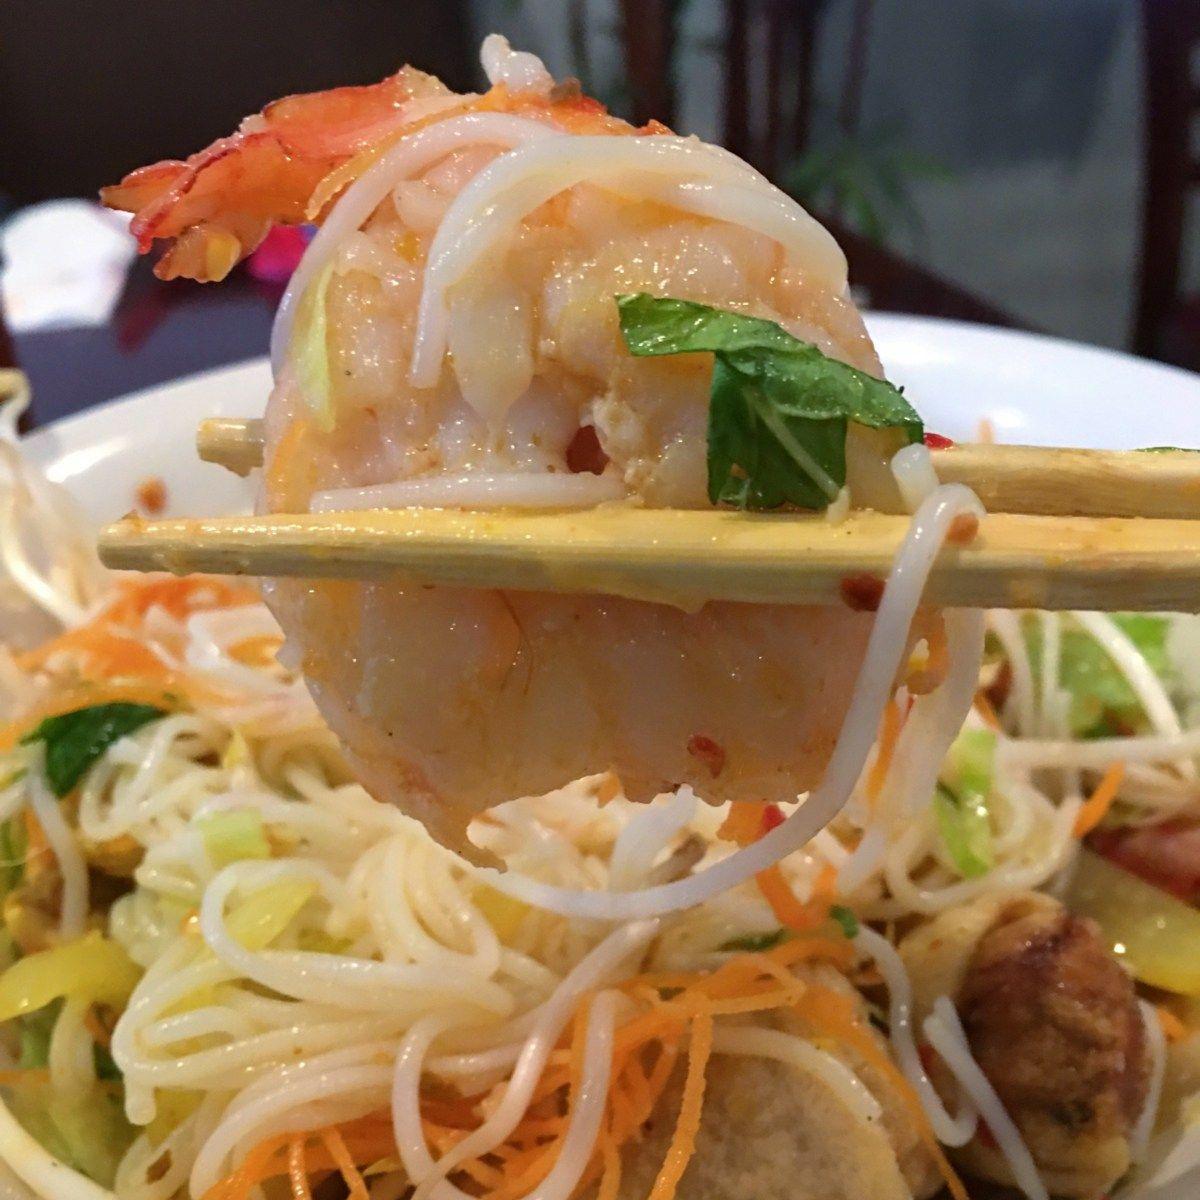 Miss Saigon A True Vietnamese Family Restaurant Coral Gables Love Vietnamese Restaurant Coral Gables Miami Food